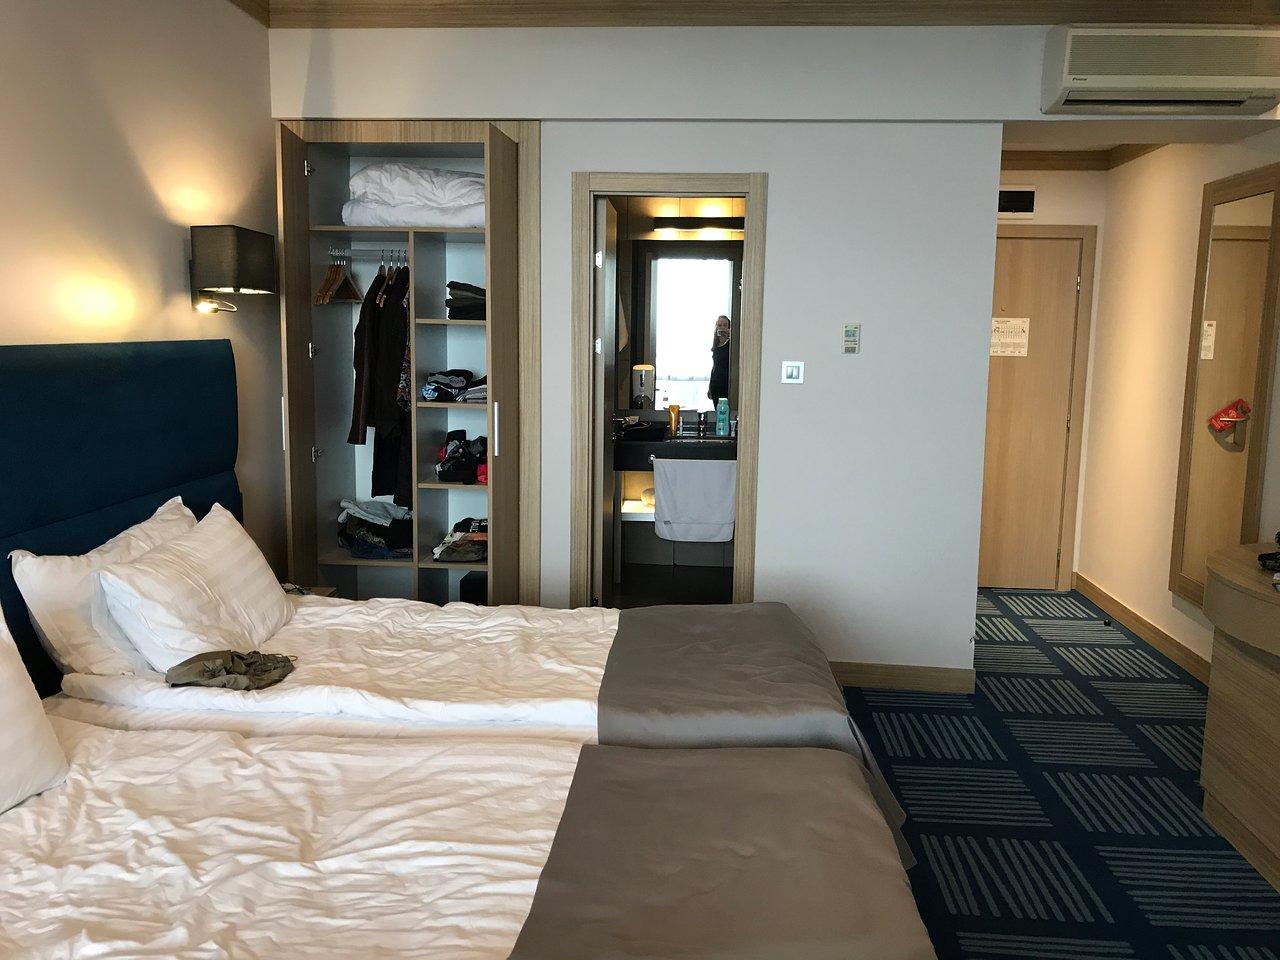 Hotel Club Viva 4 (TurkeyMarmarisArmutalan): photos, room description, service, tips and tourist reviews 57